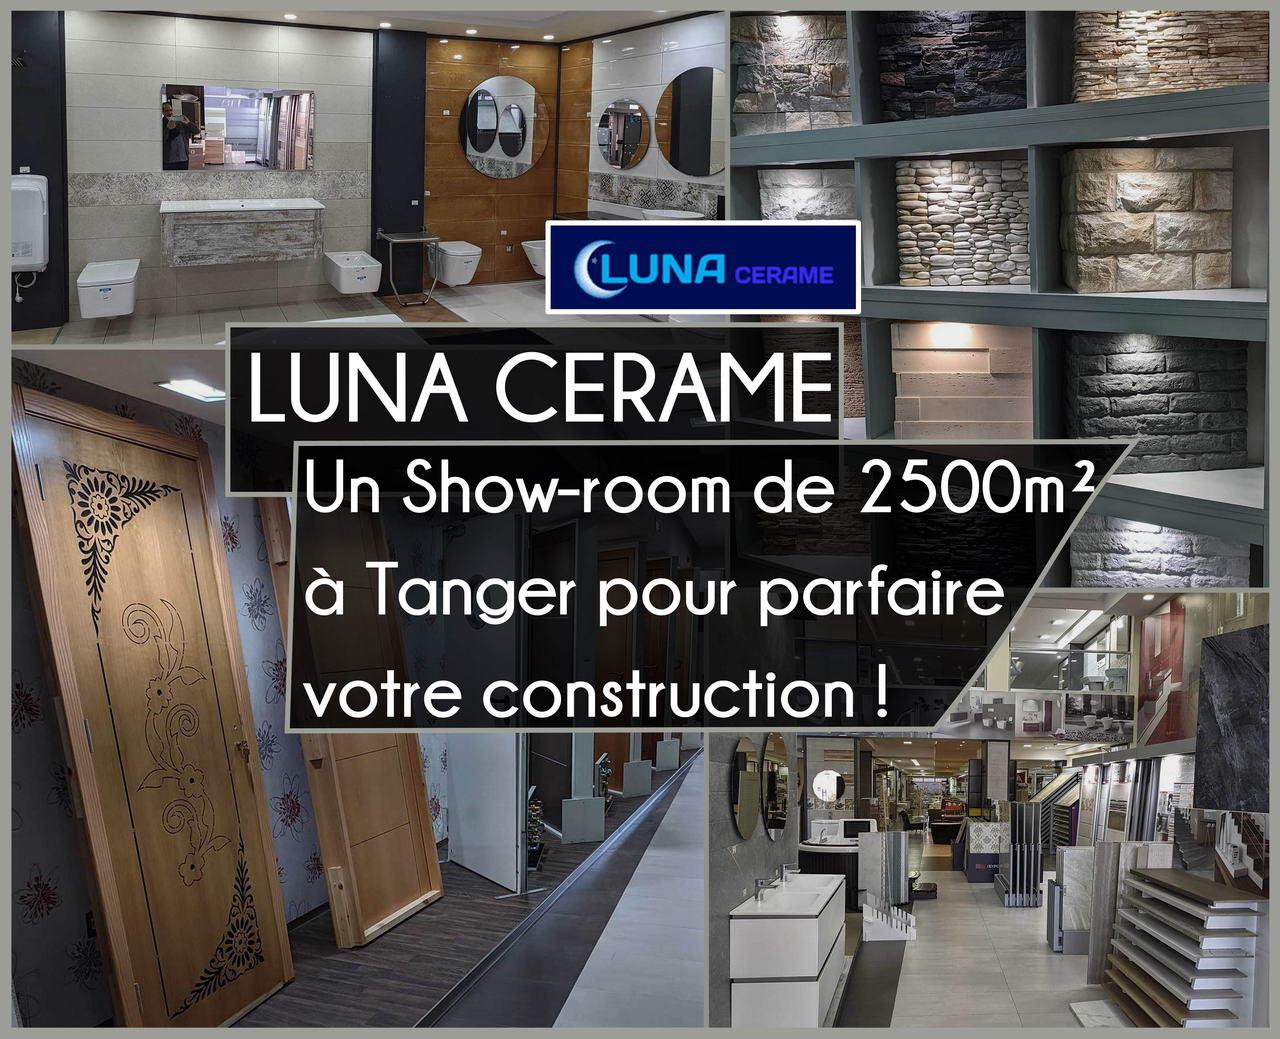 featured image lunacerame mabani.info mabani.ma